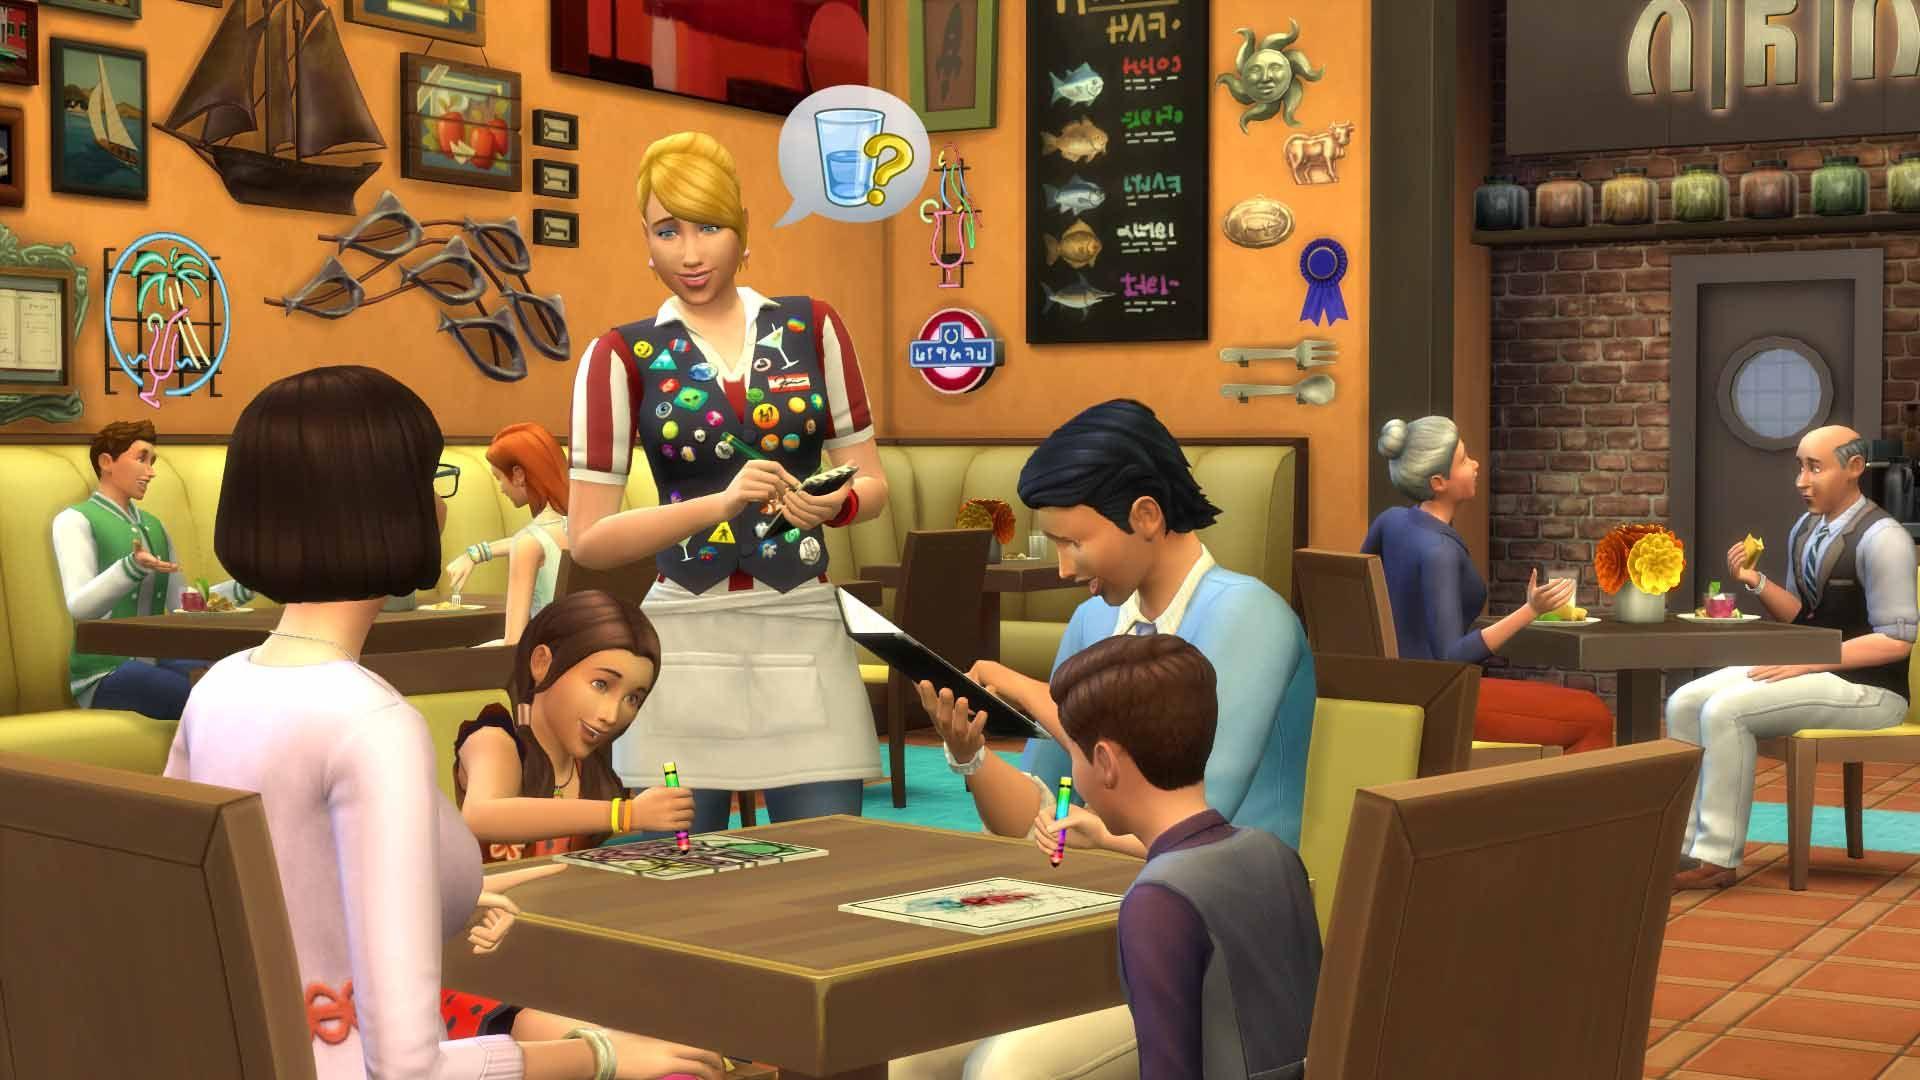 Die Sims 4 Gaumenfreuden + Elternfreuden Gamepack DLC (Origin Access, PC + Mac)